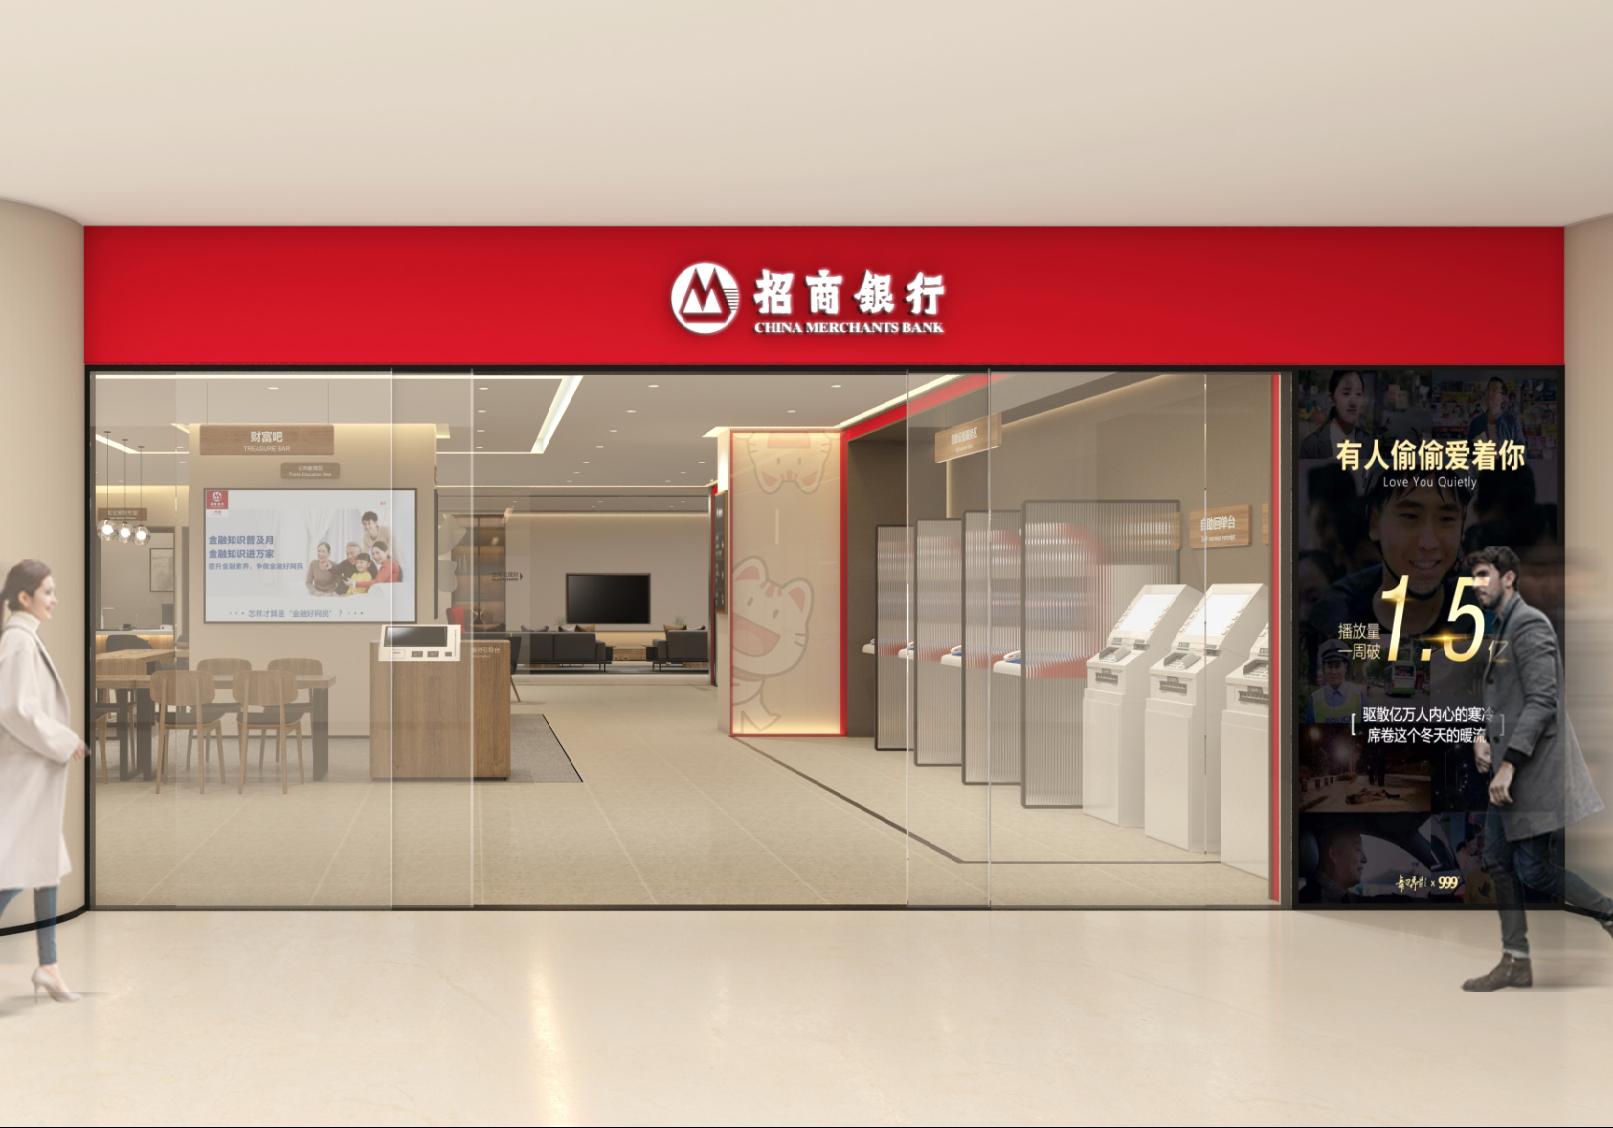 Design for 3.0 Plus Bank outlets of Merchants bank | DesignCM